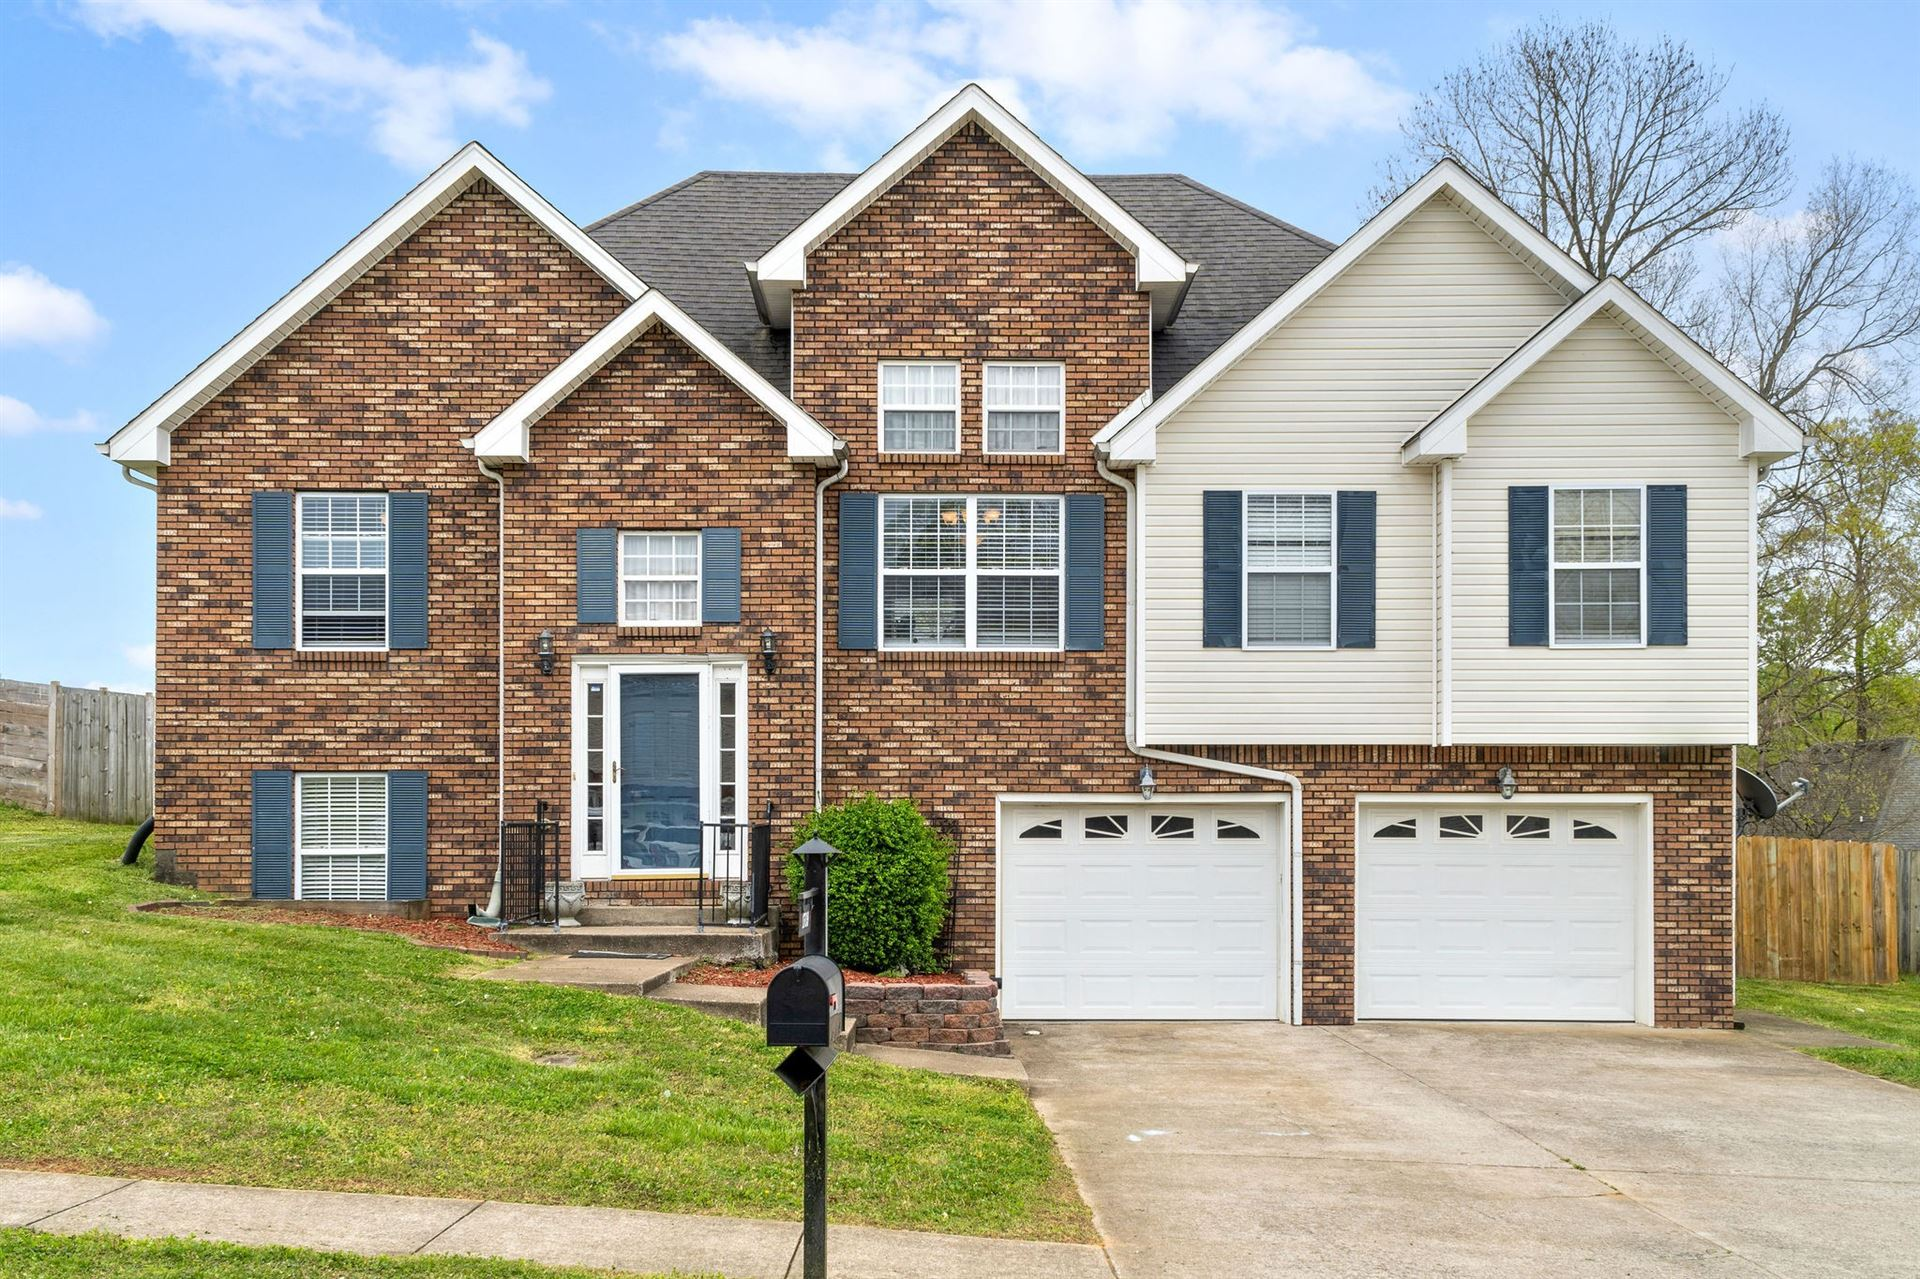 1709 Flagstone Dr, Clarksville, TN 37042 - MLS#: 2244811